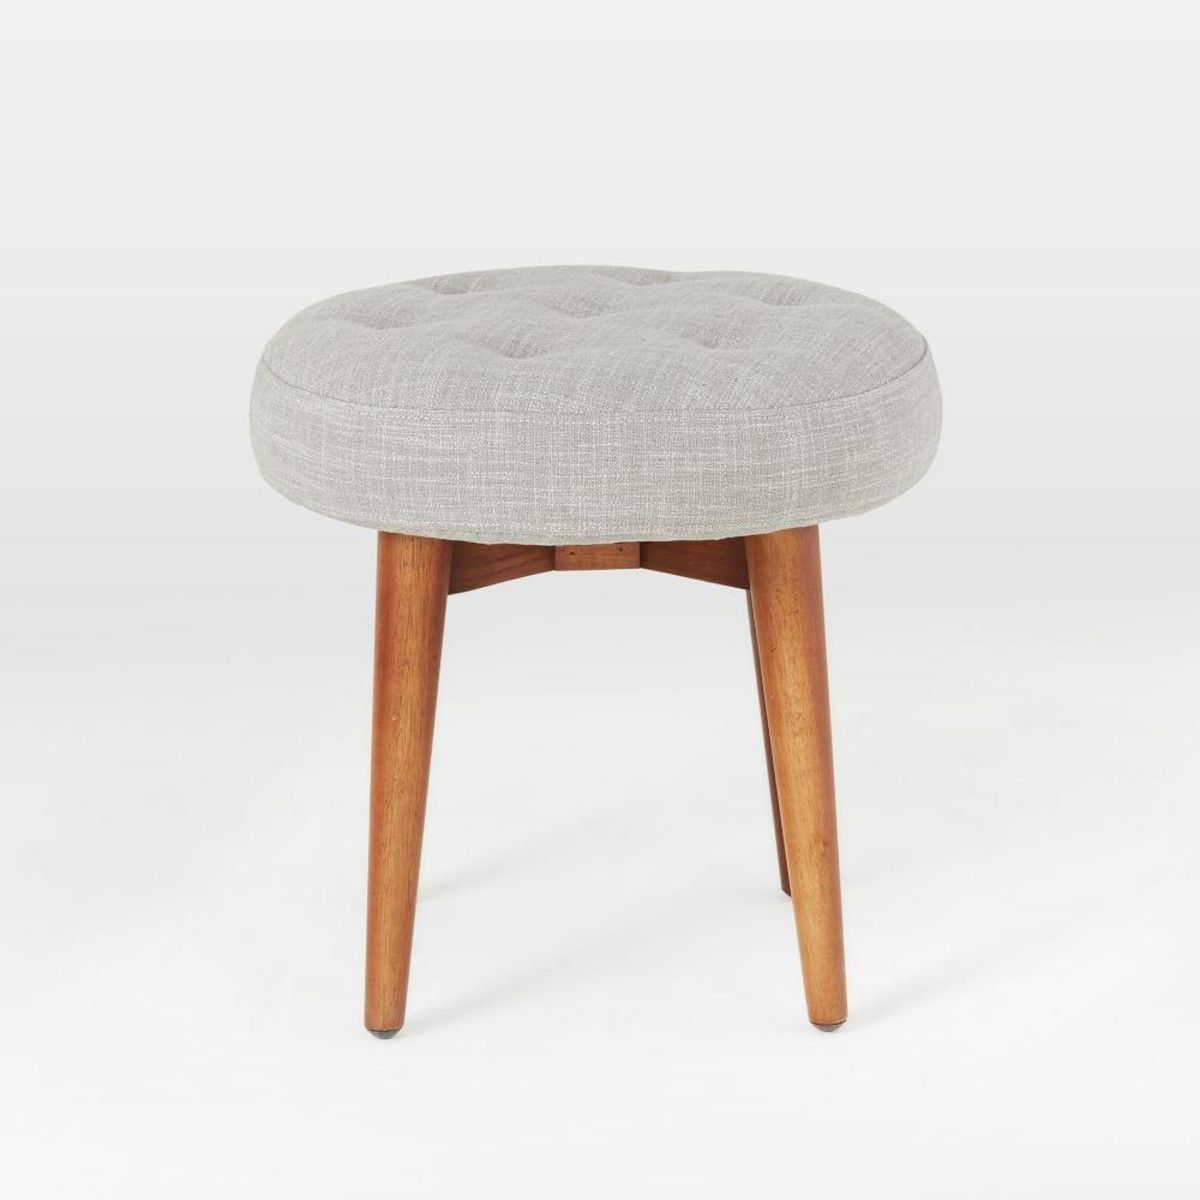 Mid Century Upholstered Stool Upholstered Stool Stool Wooden